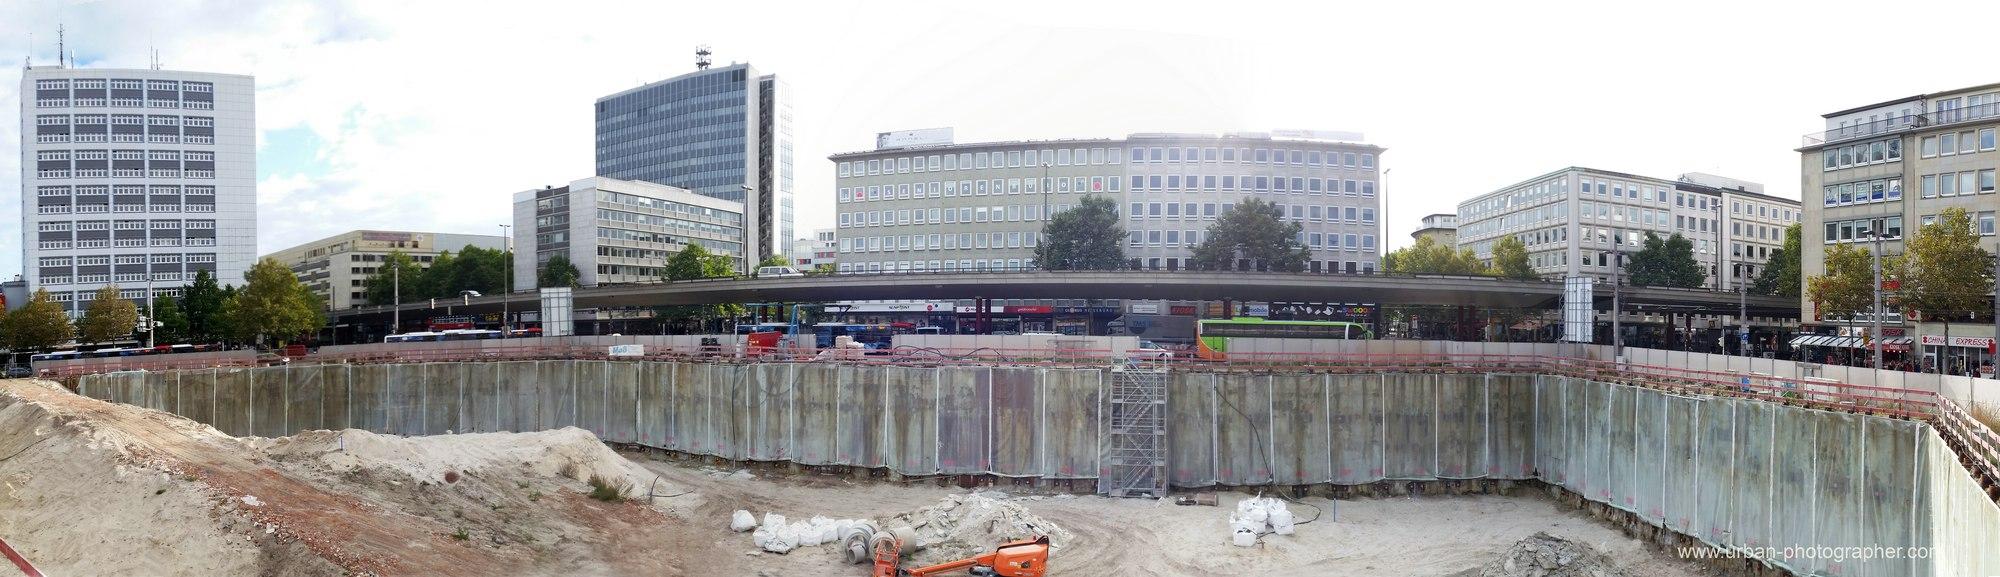 Baustelle Bahnhofsplatz 72